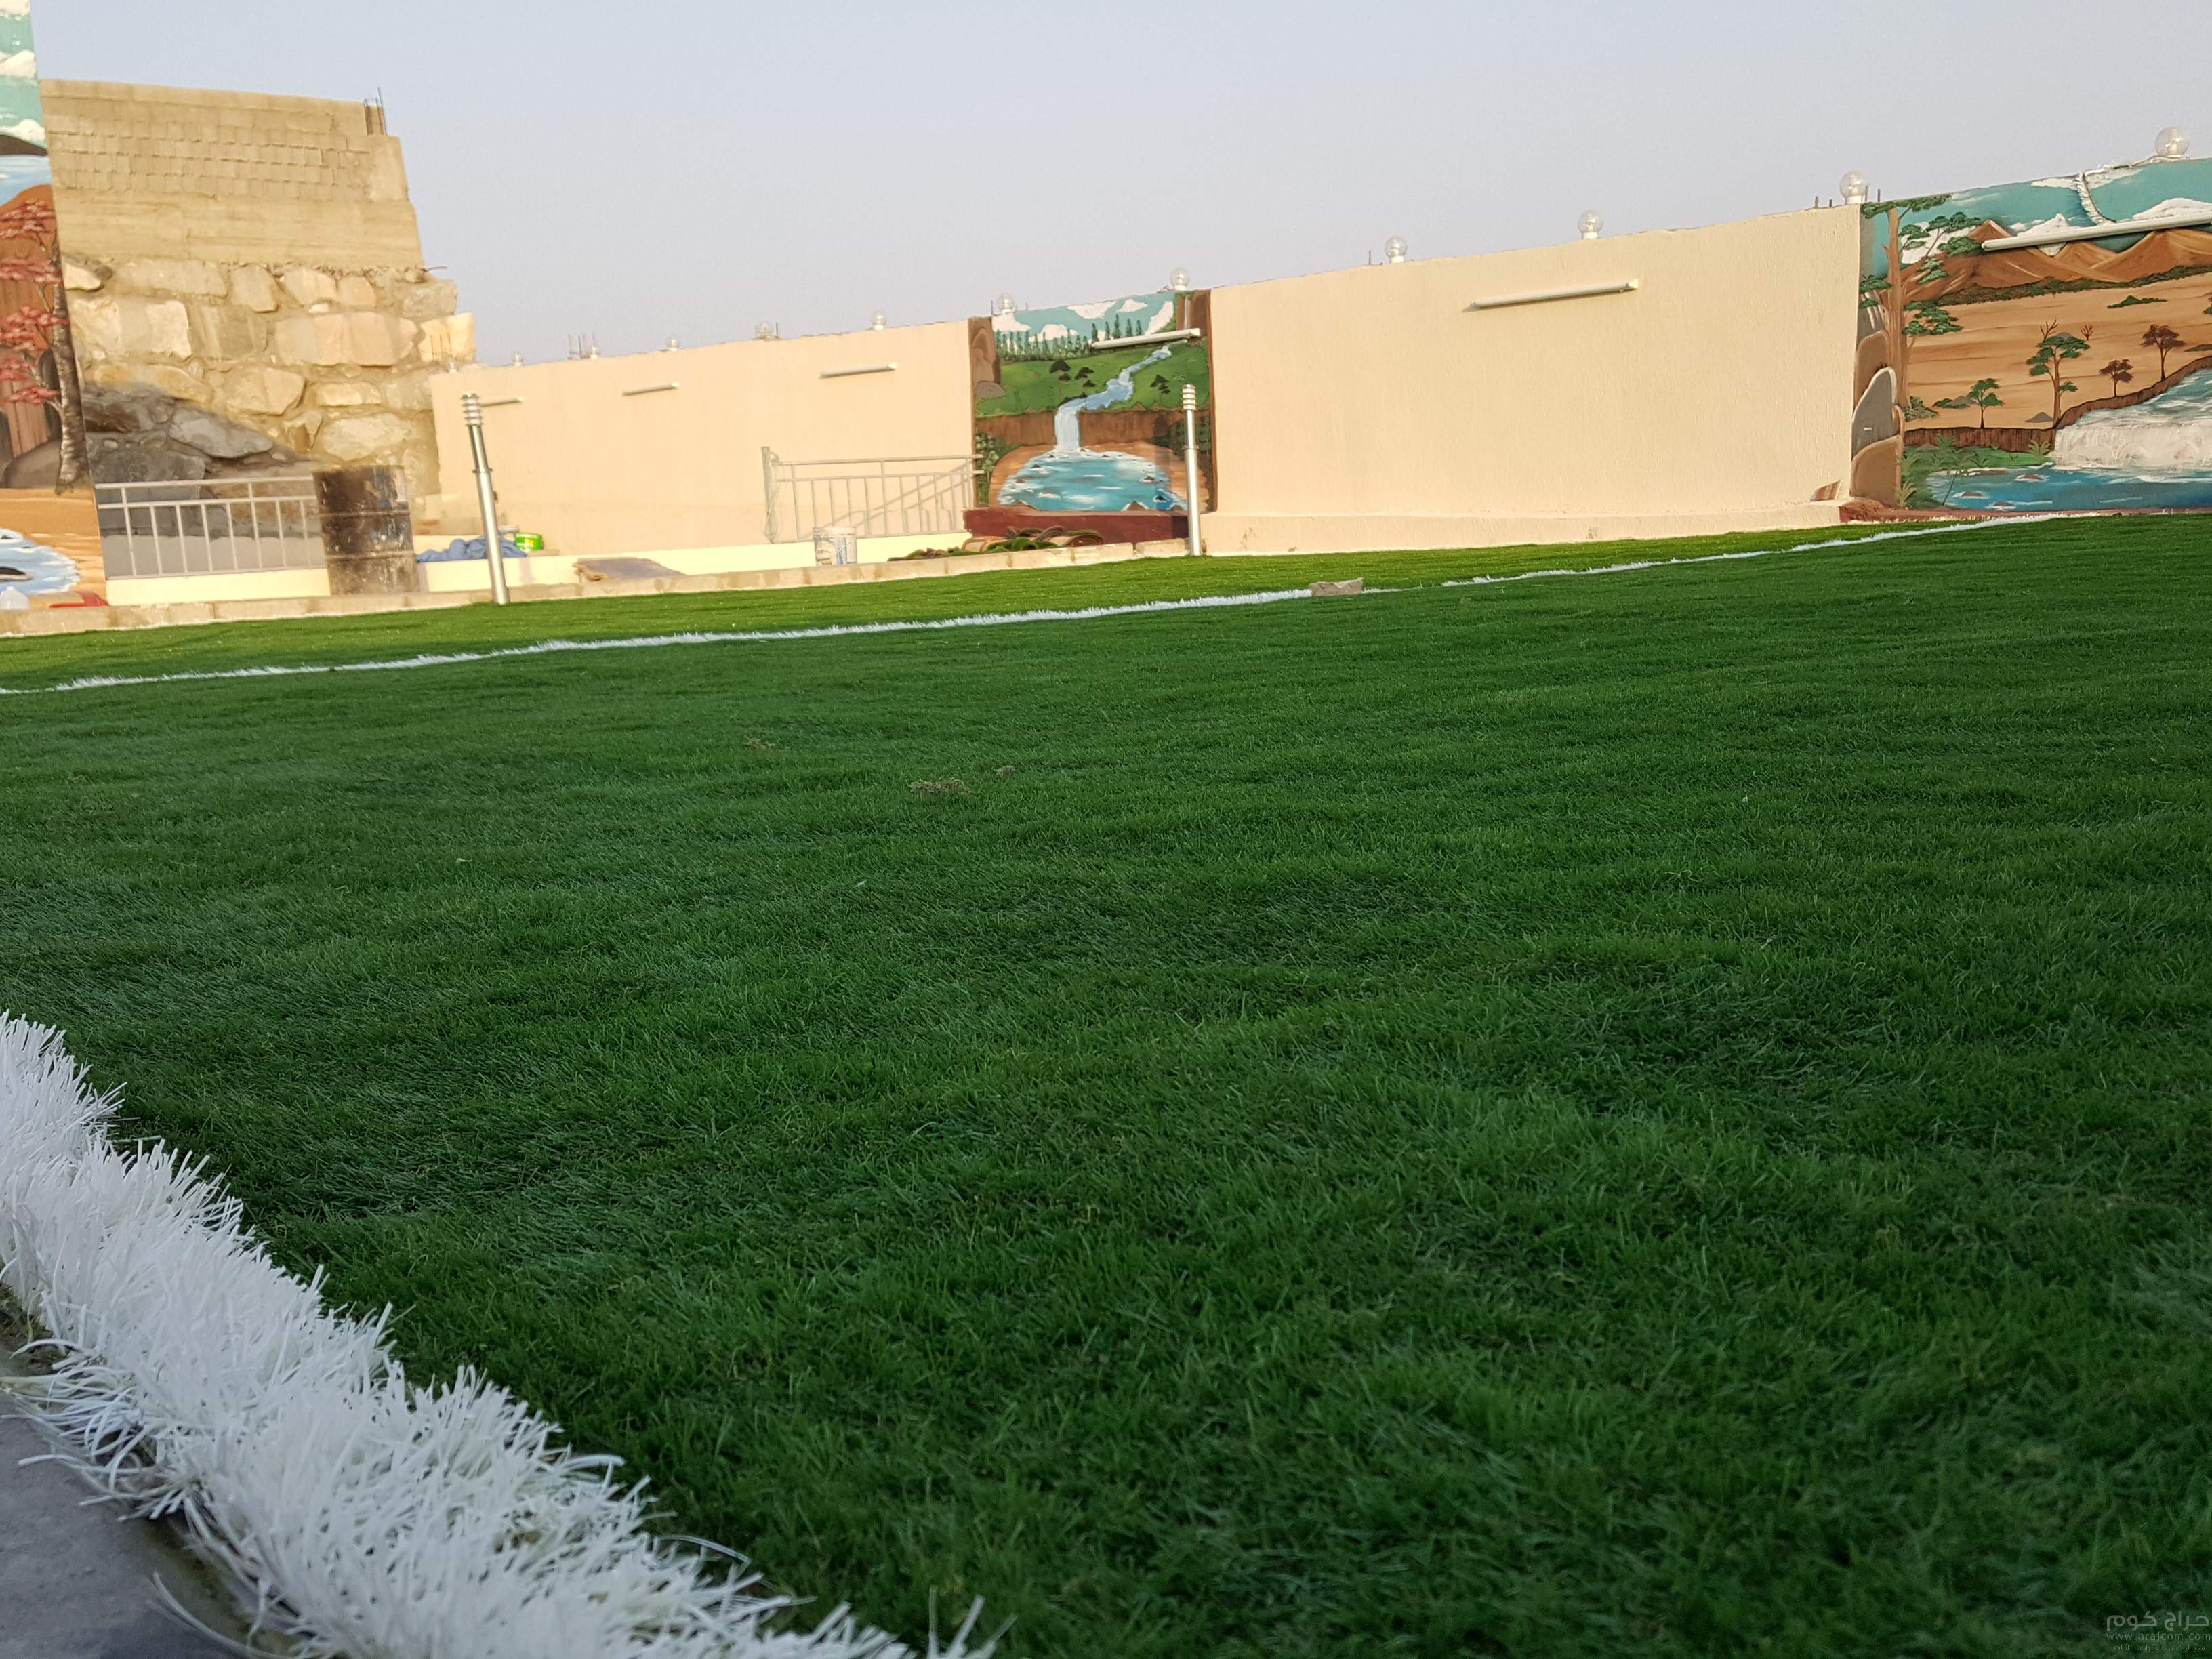 عشب صناعي مسطحات خضراء ملاعب حدائق استراحات